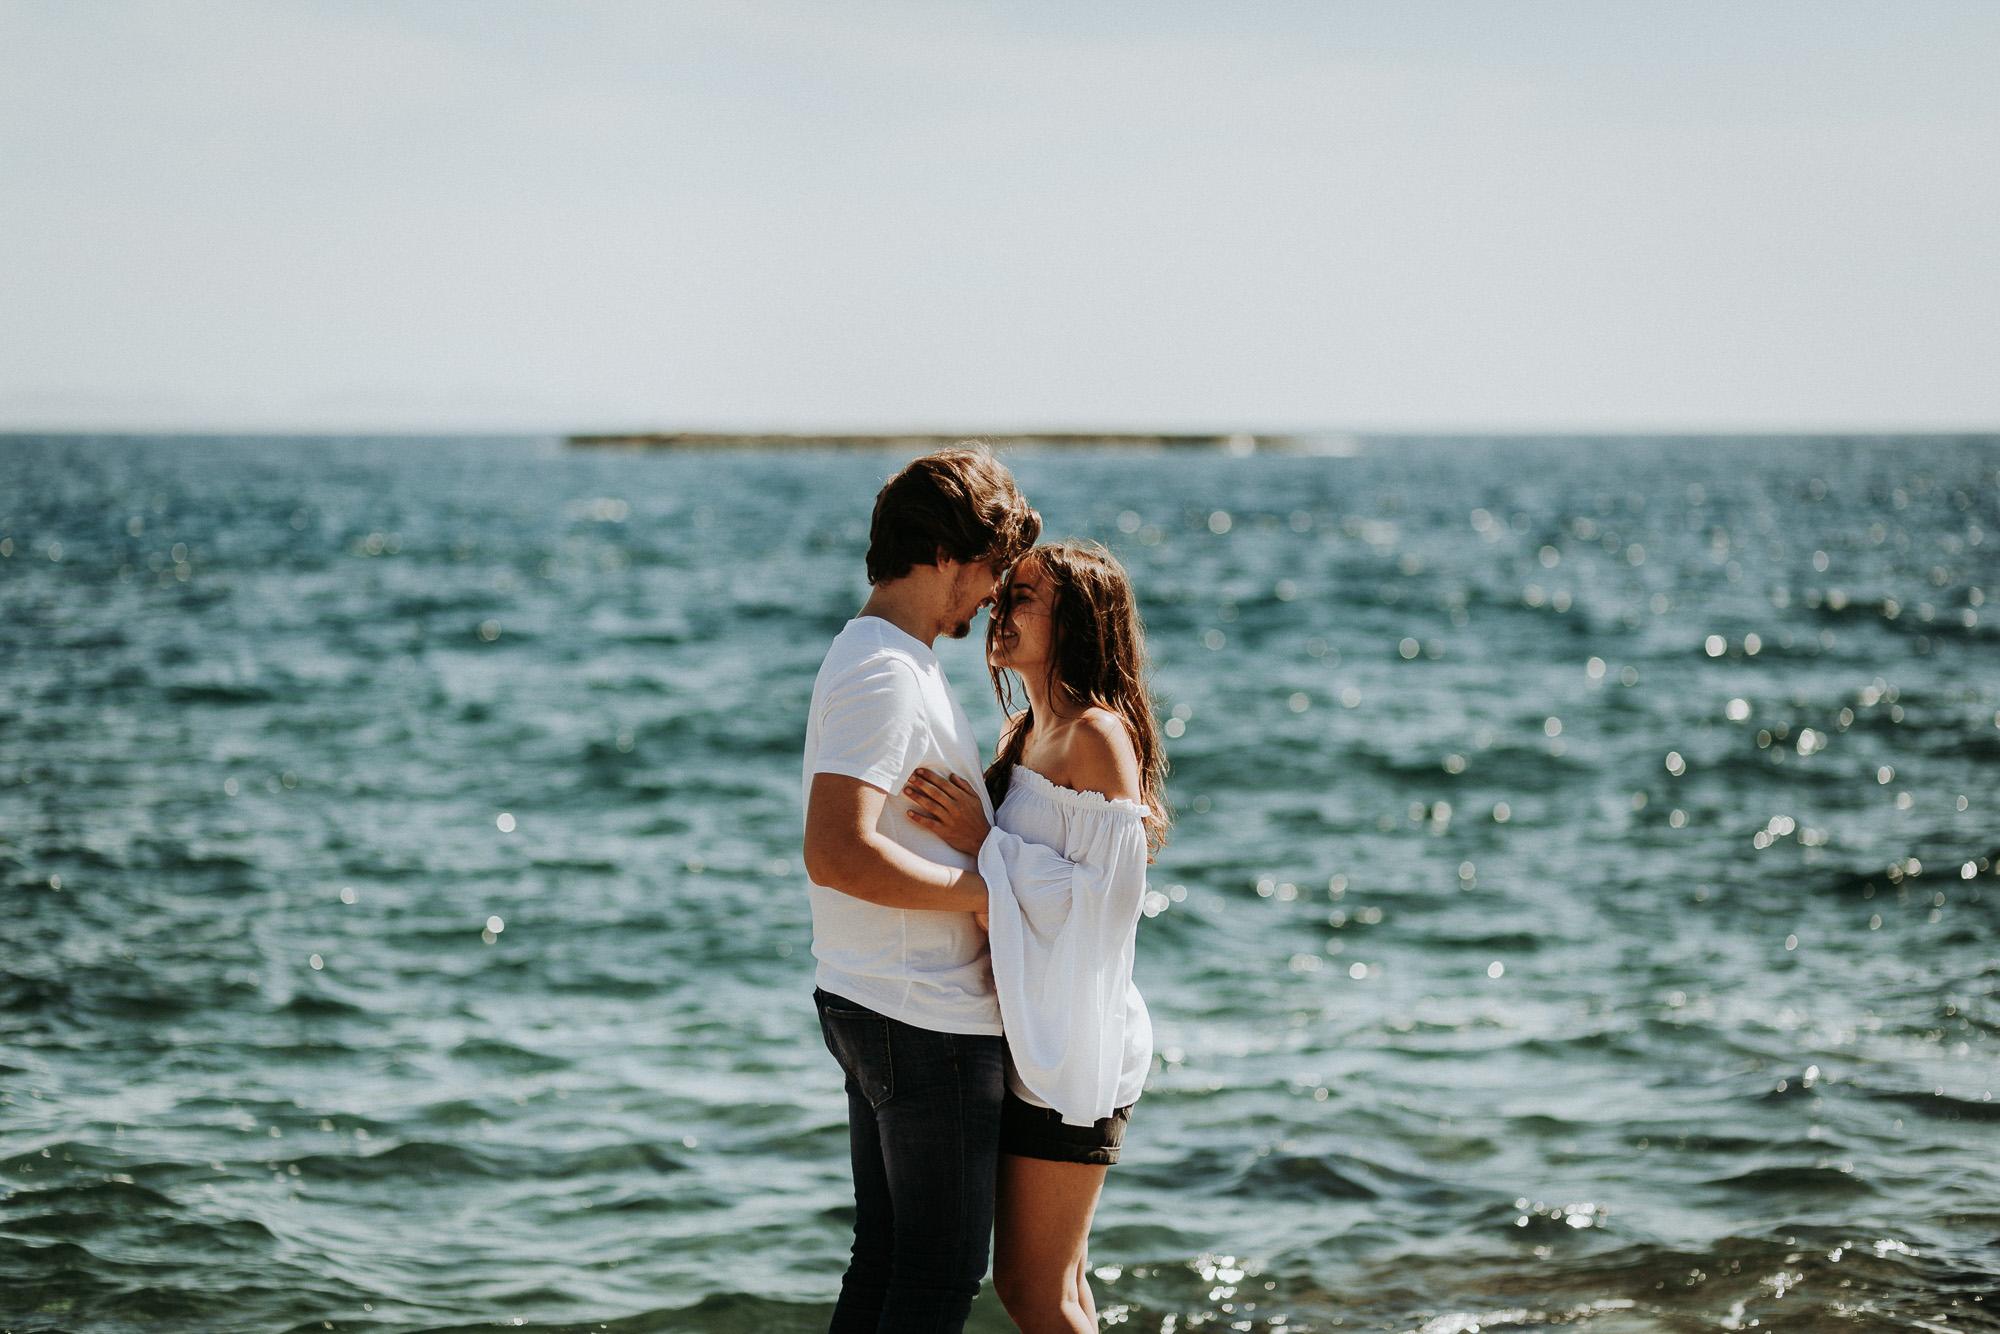 DanielaMarquardtPhotography_wedding_elopement_mallorca_spain_stjordi_sessalines_marinaandxavi170